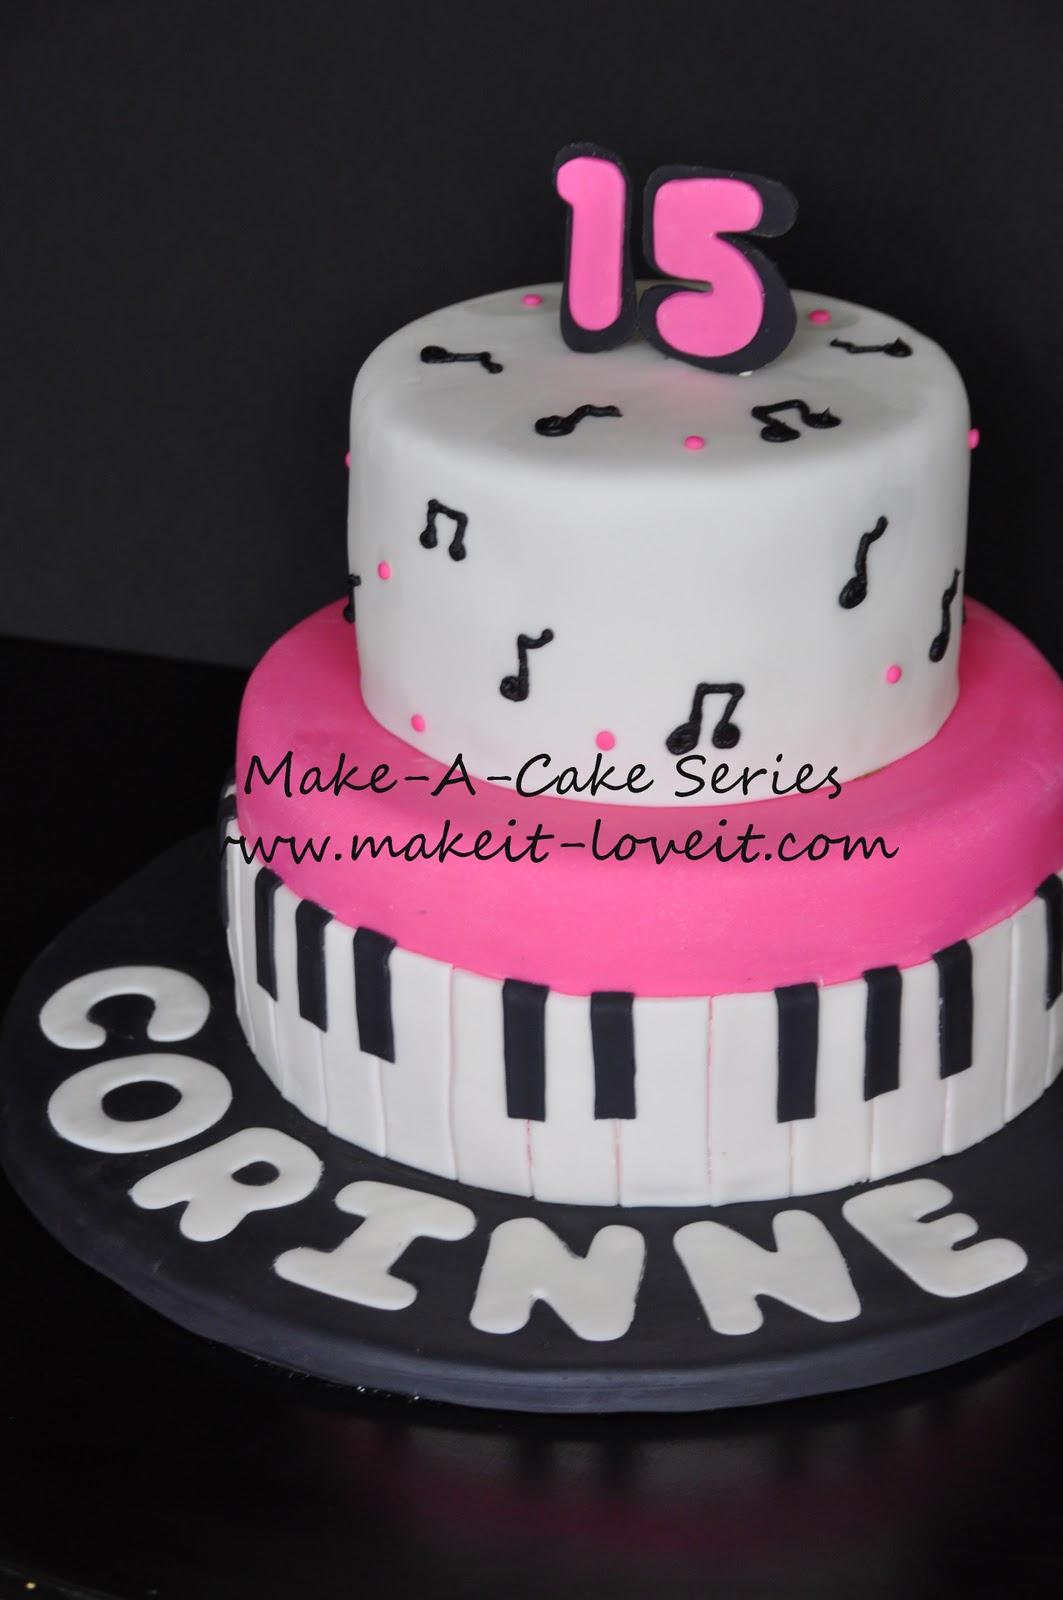 Make a cake series music cake